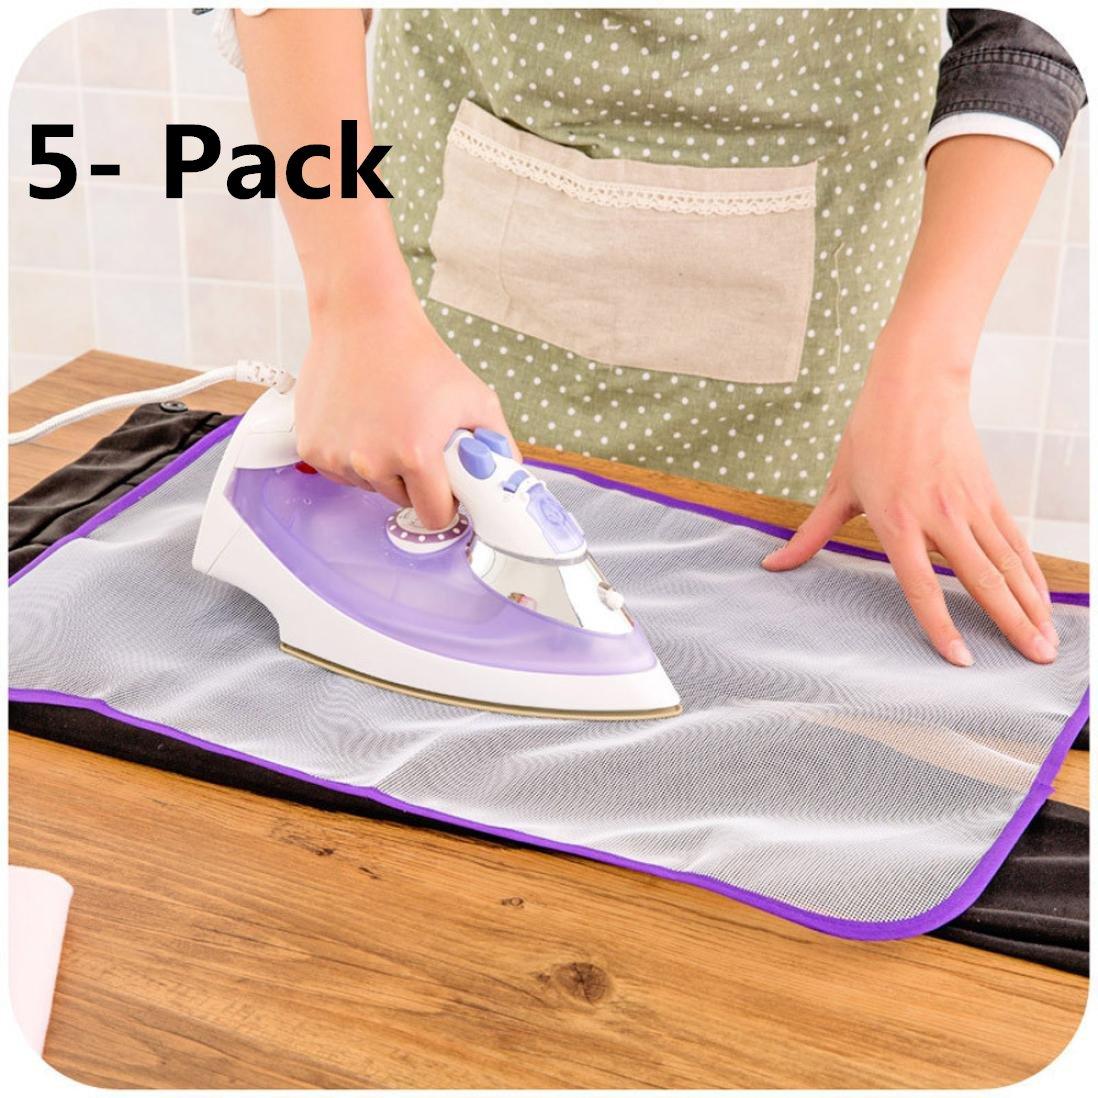 5-Pack Protective Ironing Scorch-Saving Mesh Pressing Pad Mesh Ironing Cloth Coerni